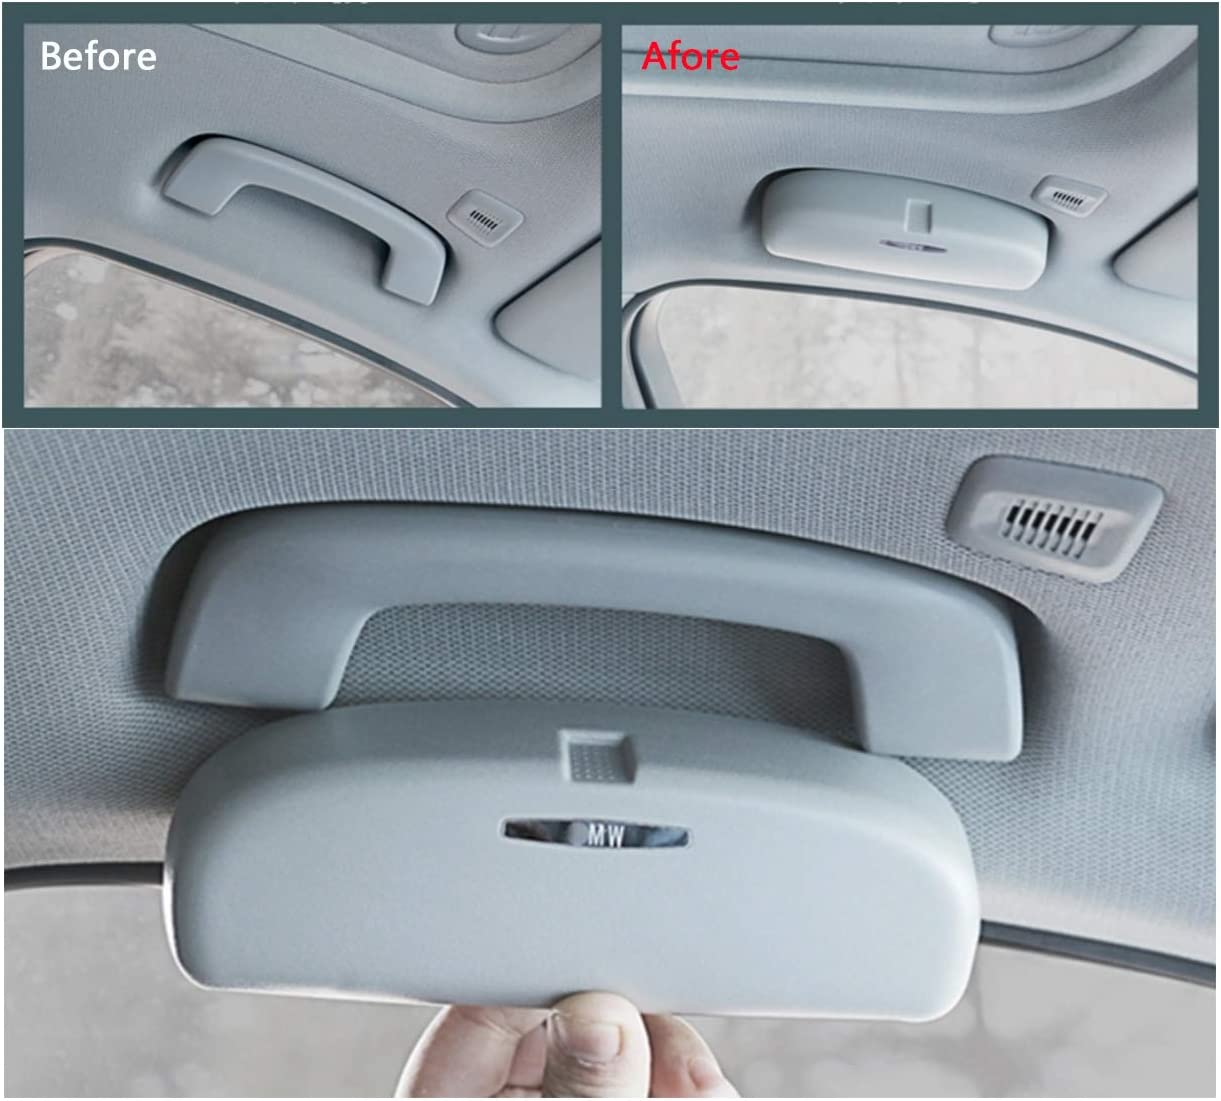 LFOTPP Car Sunglasses Holder Case Eyeglasses Storage Box Compatible with 1 Series 3 Series 5 Series 7 Series X1 X2 X5 X6,/Interior Accessories Autos Parts Beige